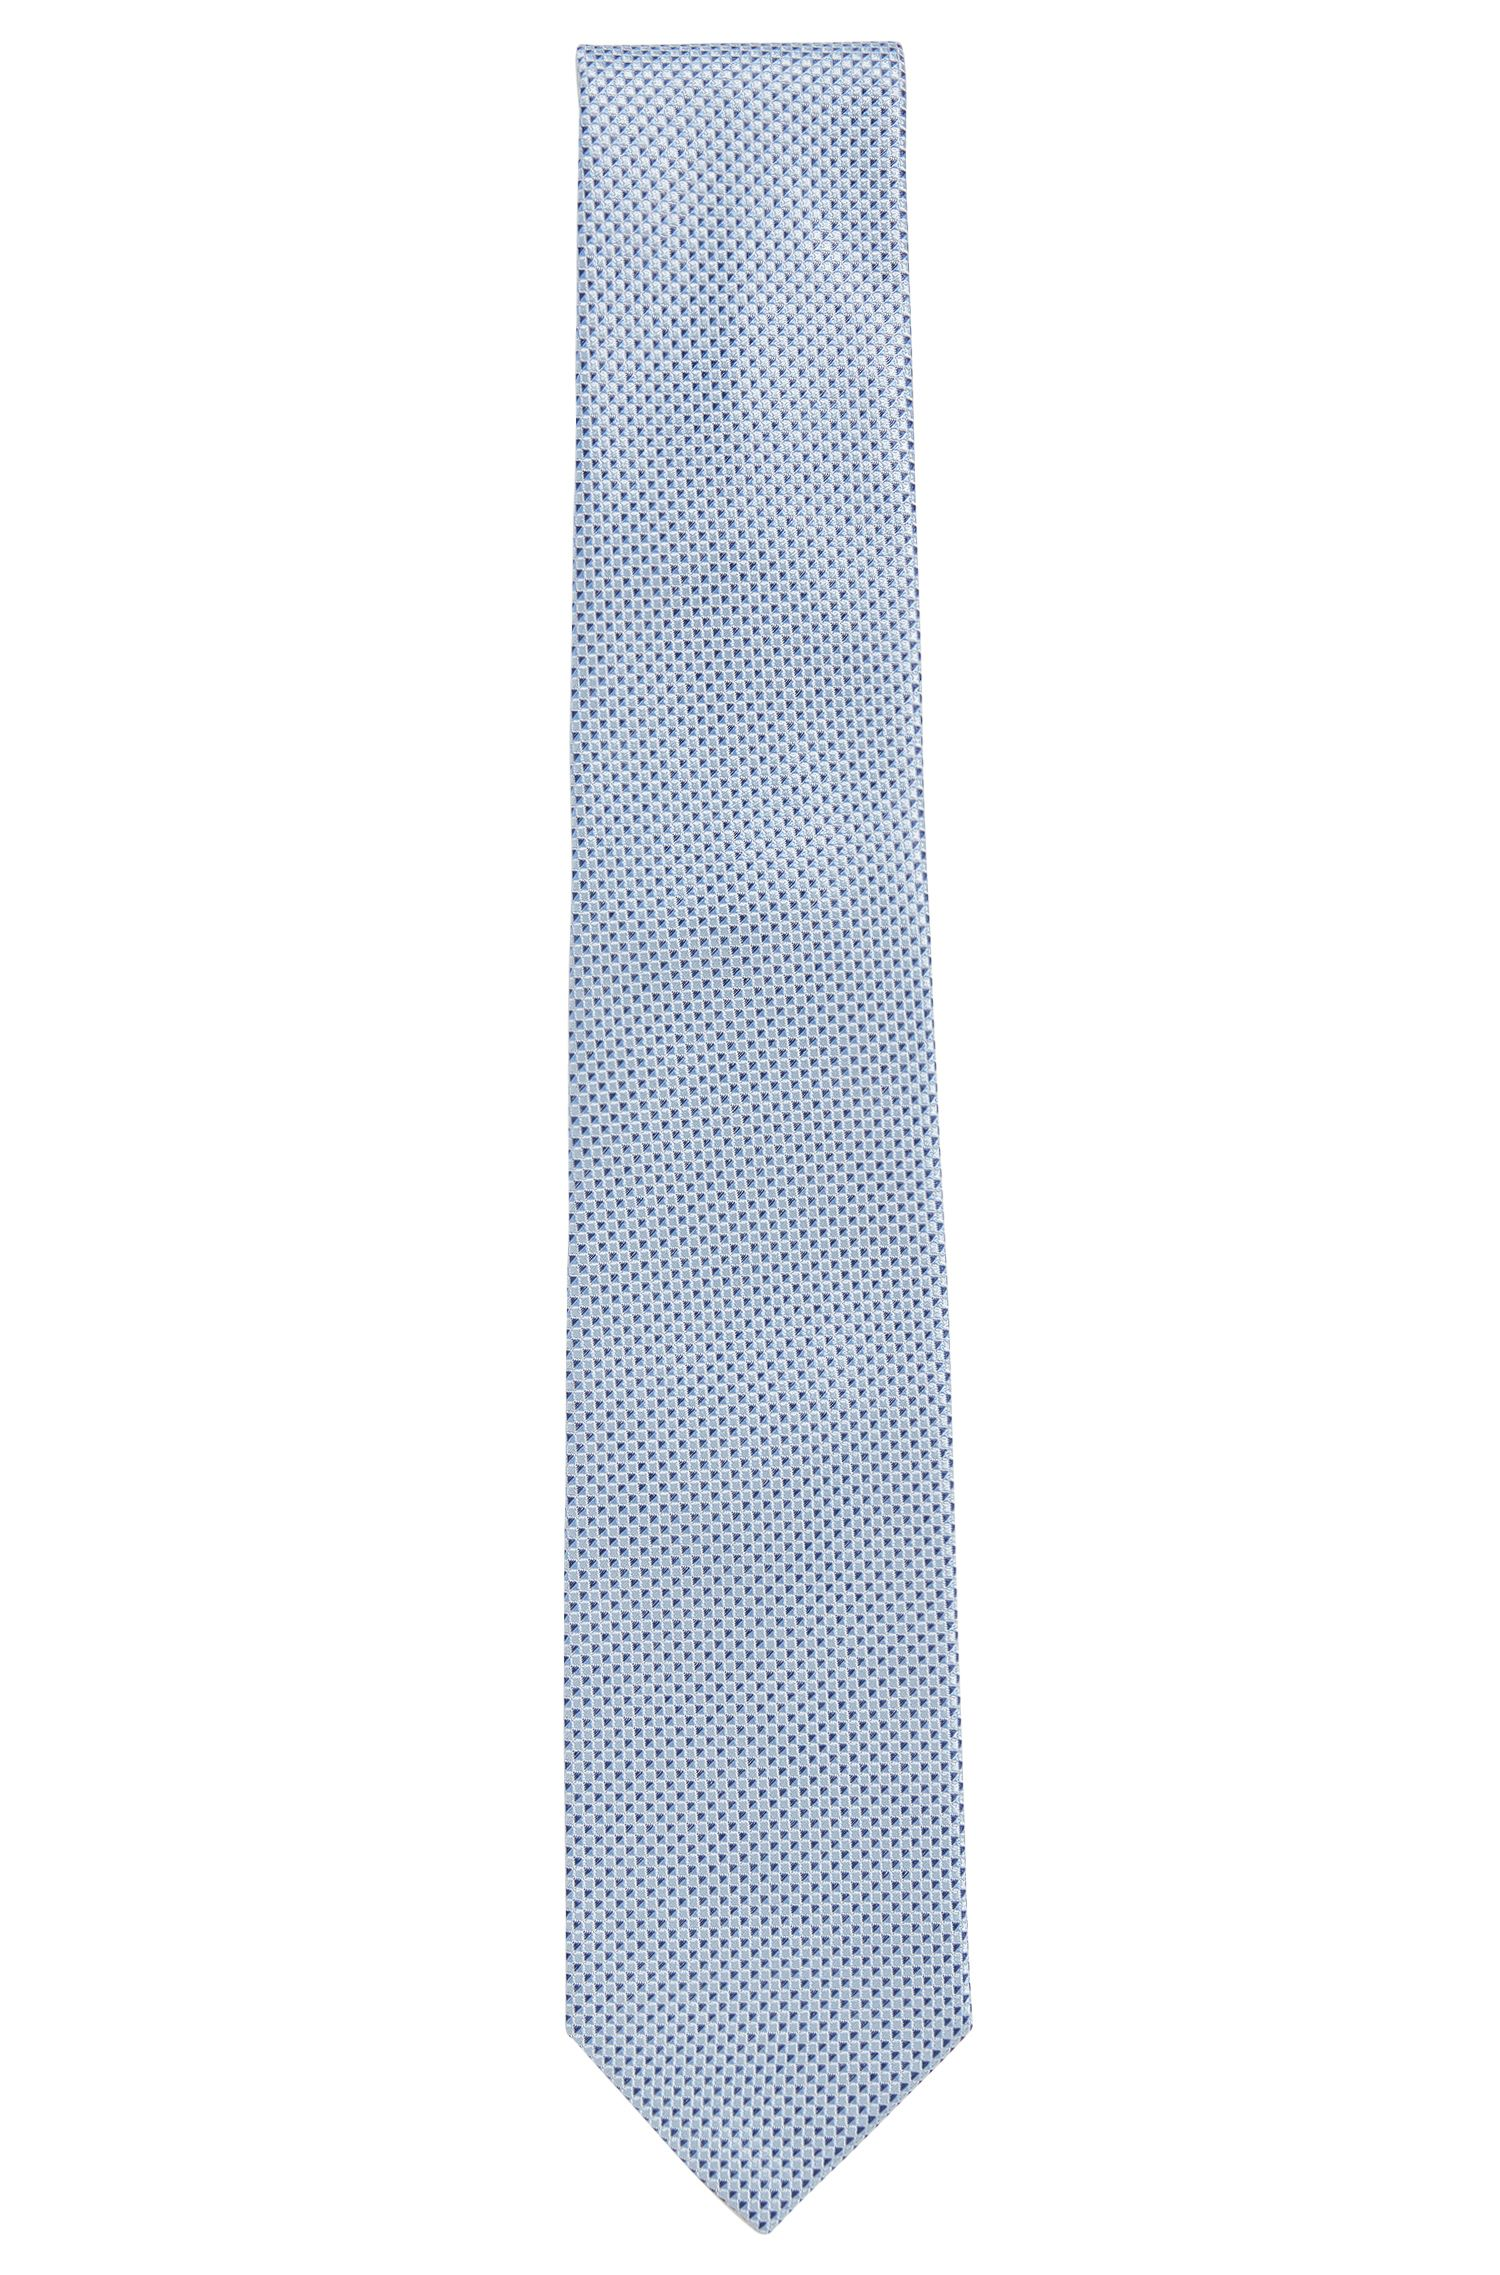 Corbata con fino estampado en seda: 'Tie 7,5cm'